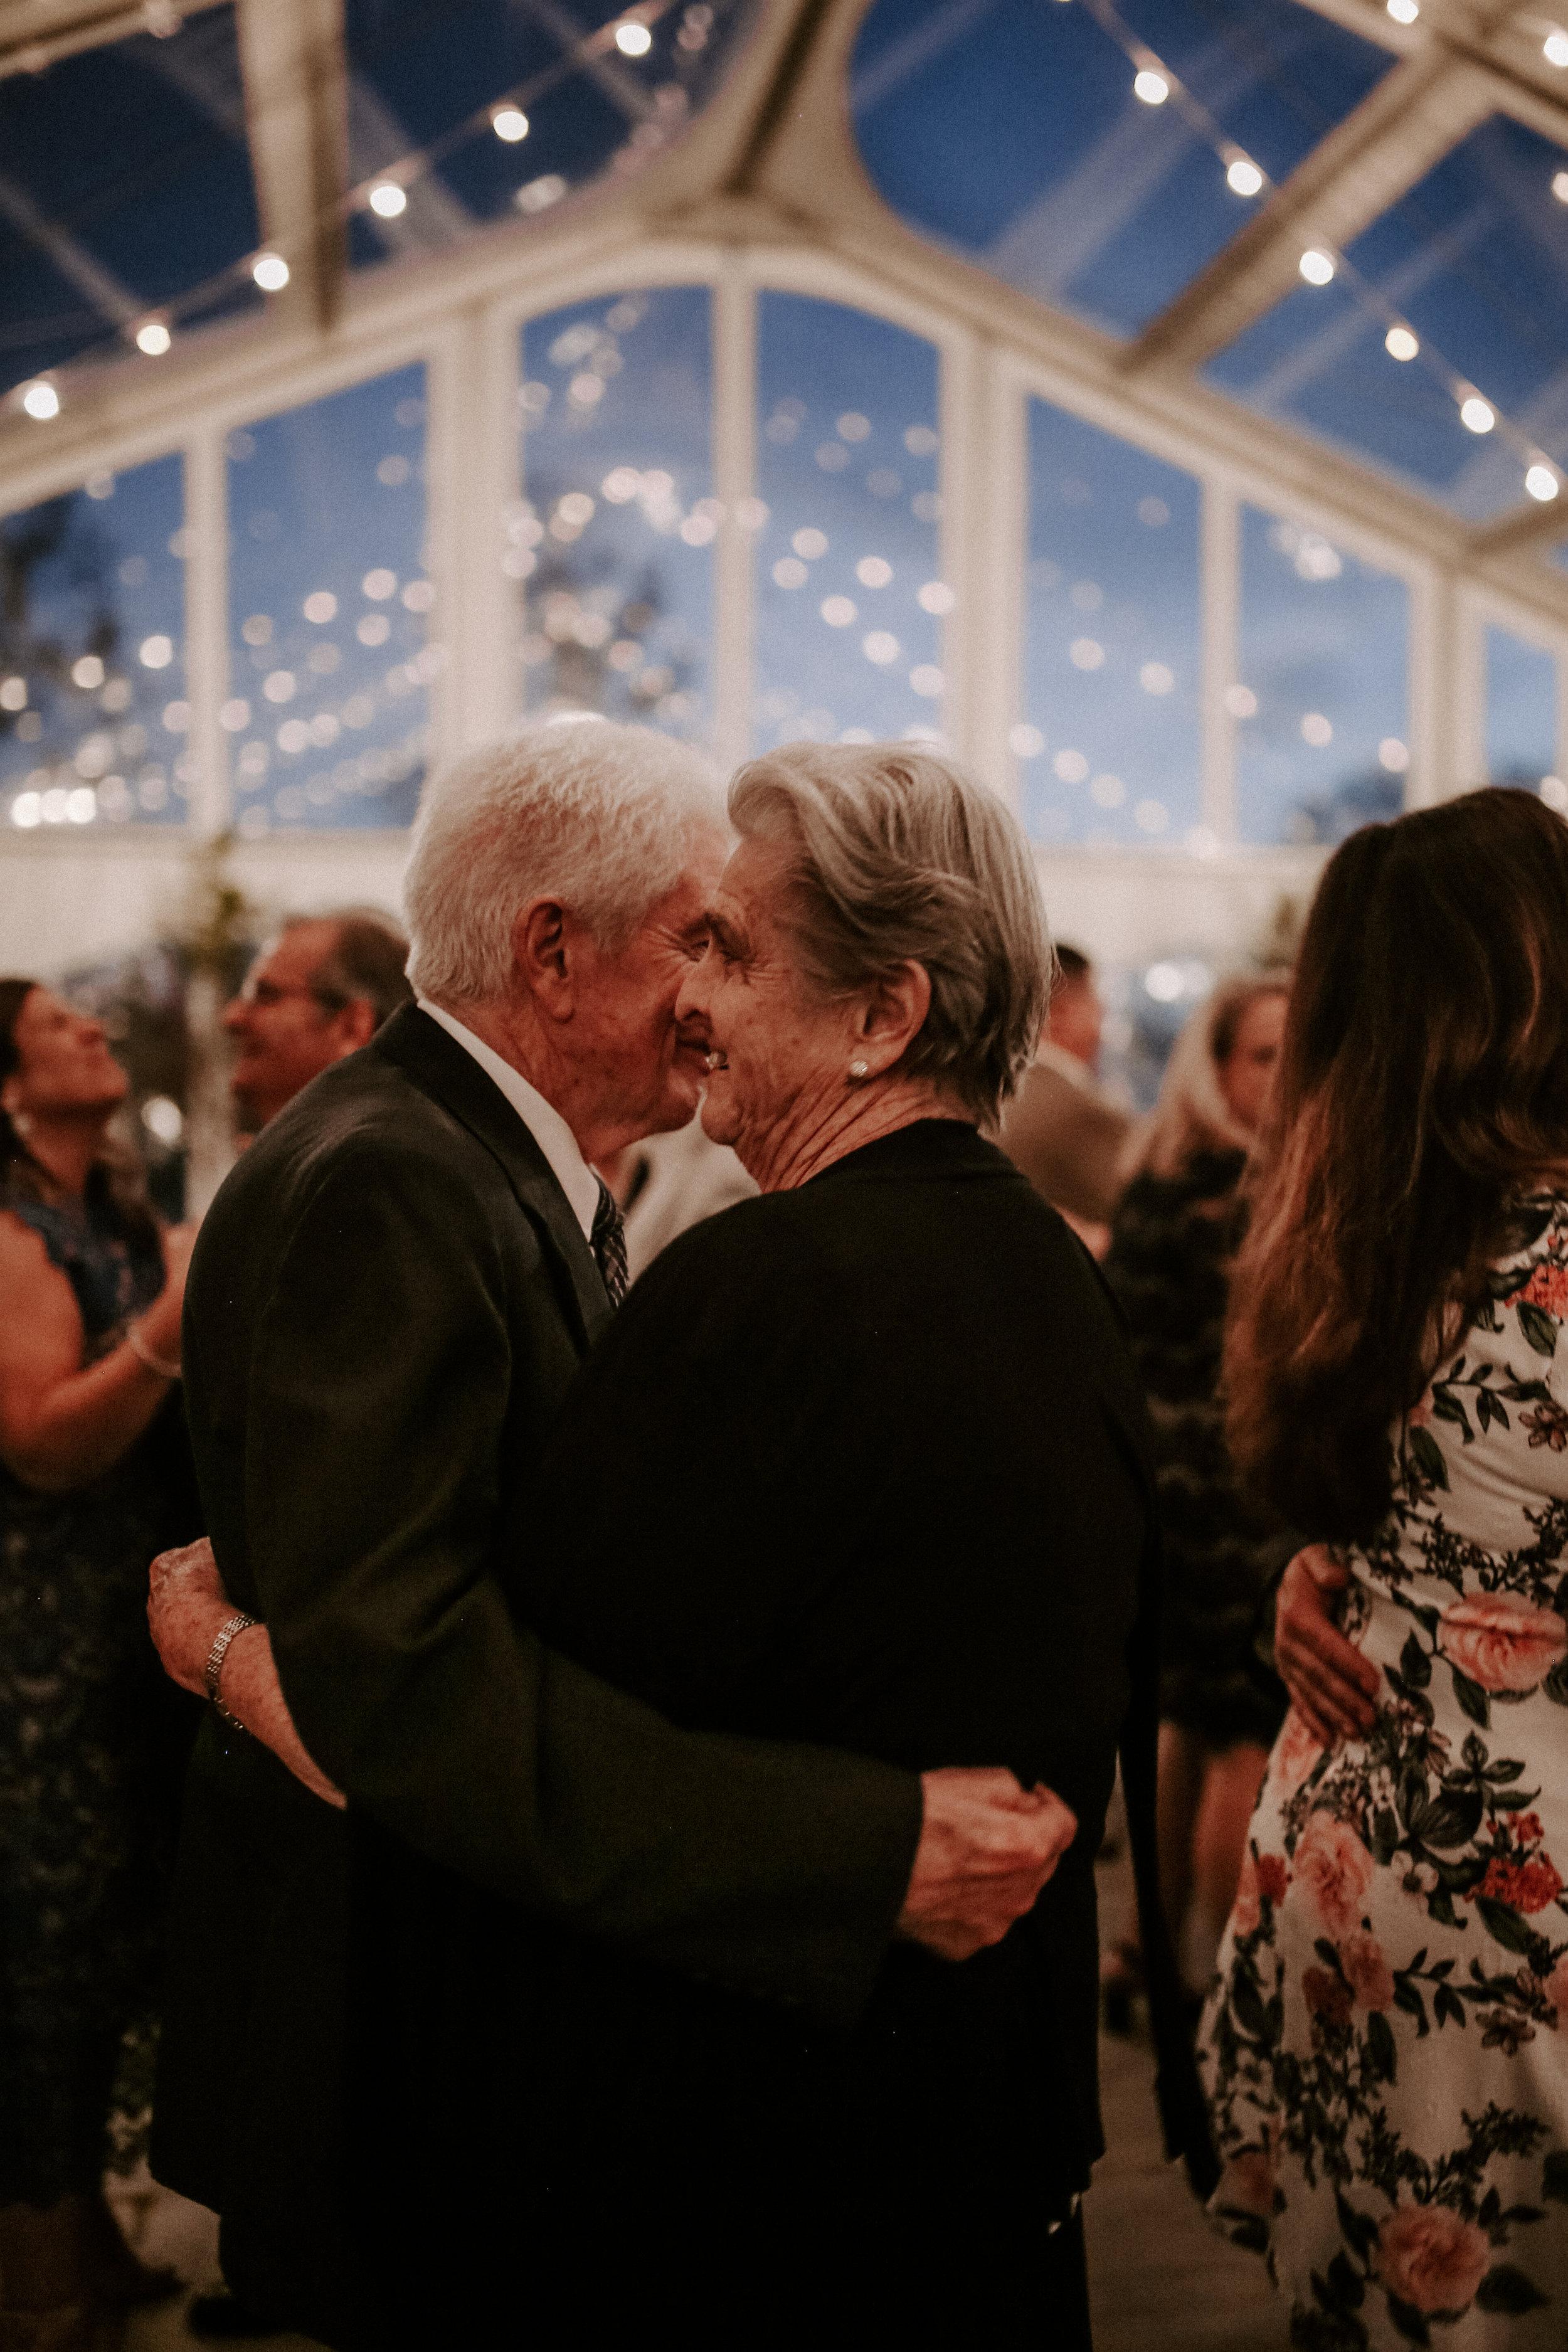 TheGreens_Married_2019-608.jpg